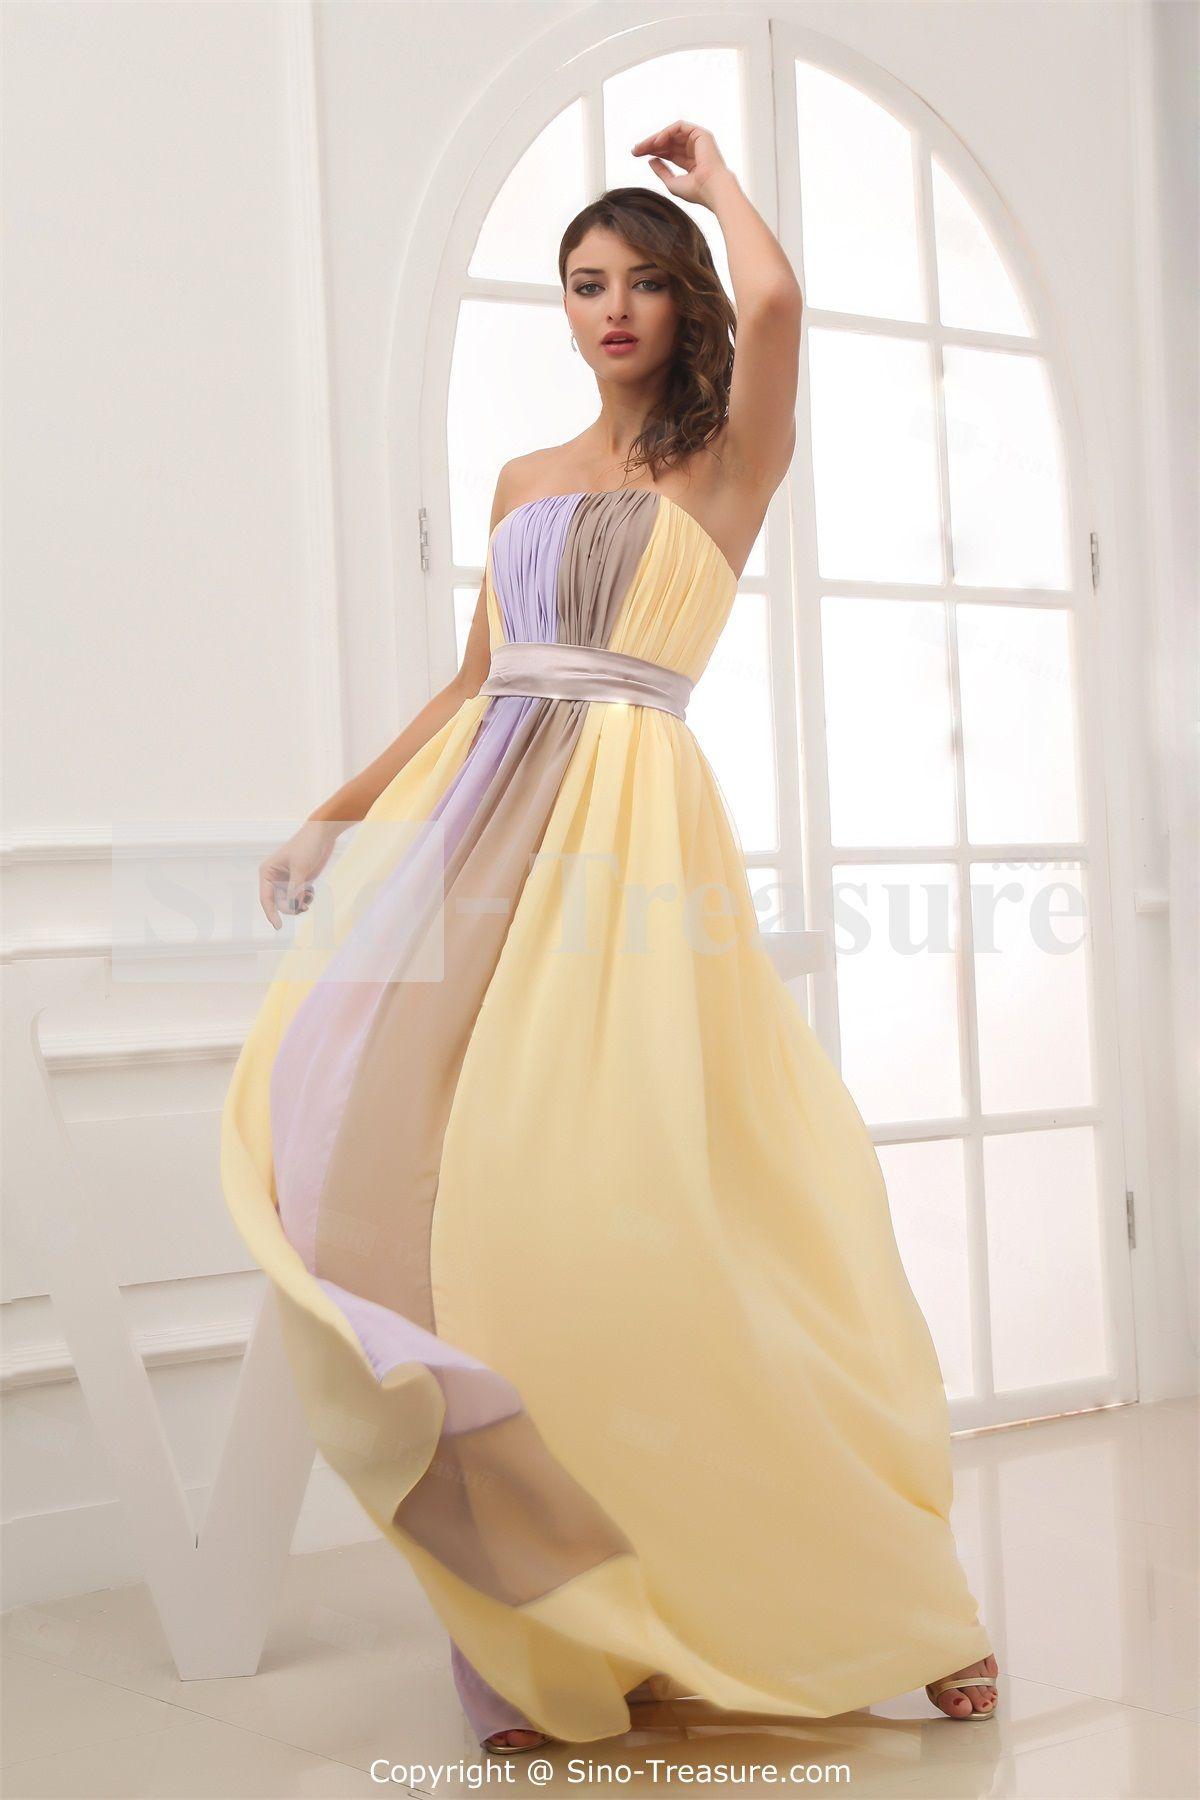 I like the shape of the billowing dress billowy beautiful